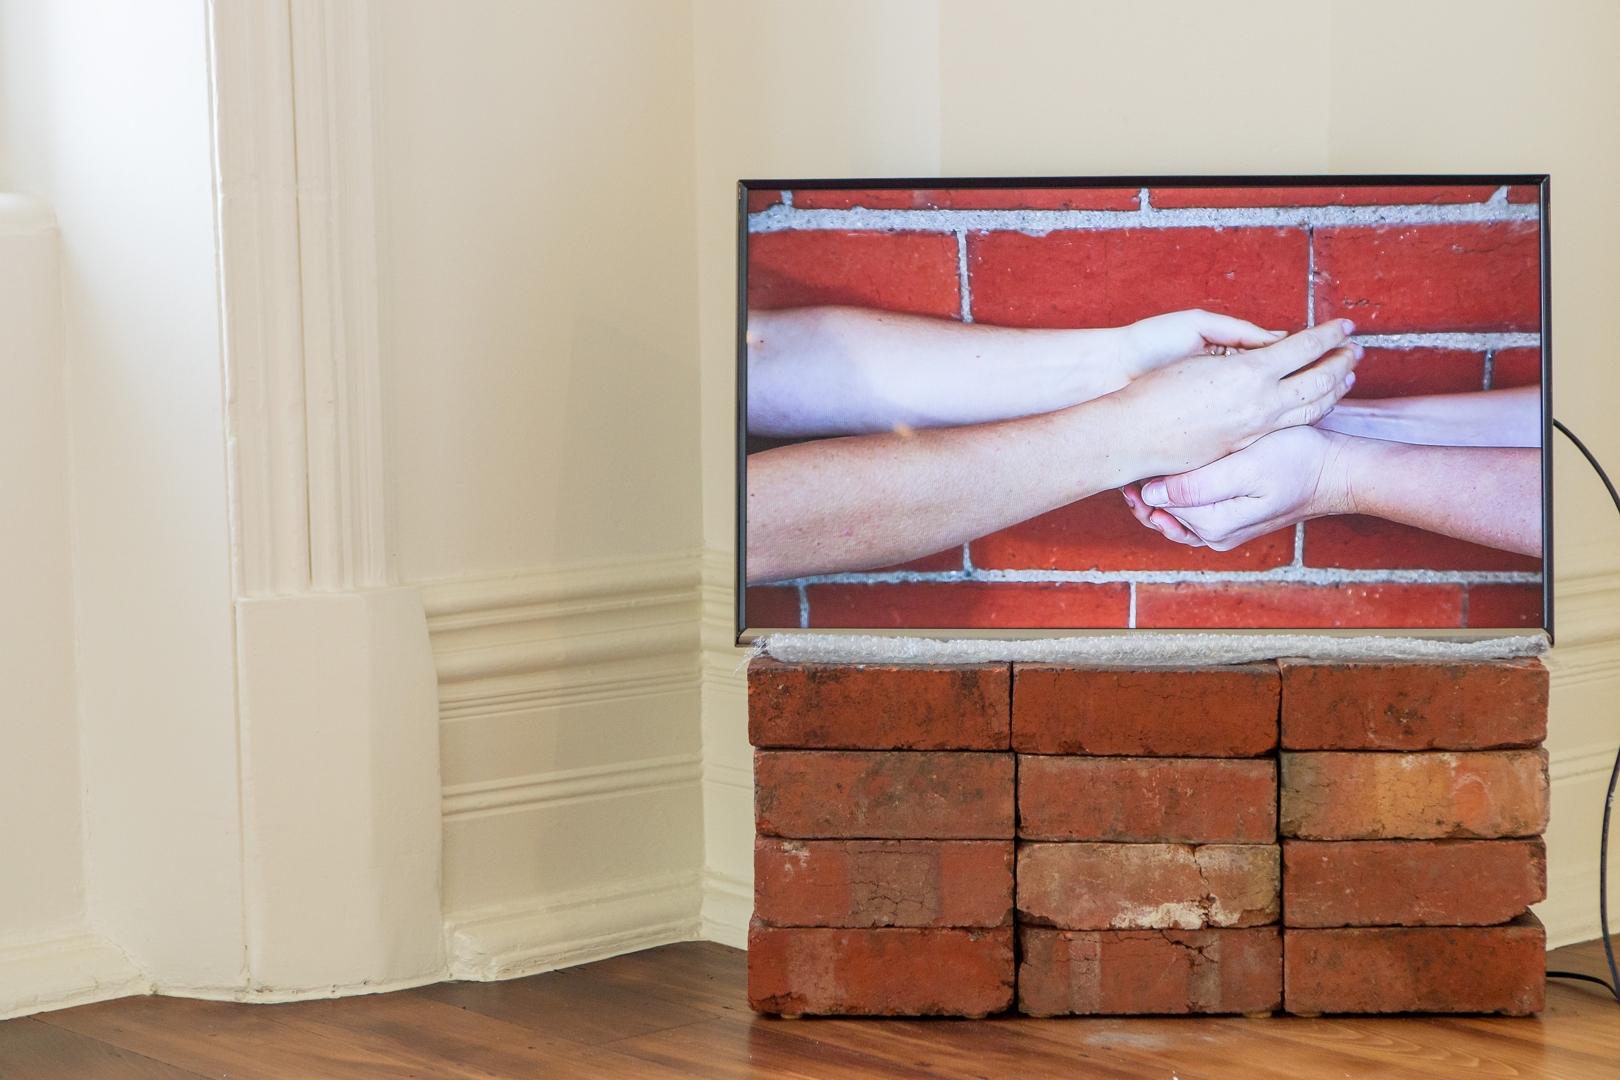 Installation Detail, 'Transfer of Gold' video work, Under Construction Exhibition, Bundoora Homestead Art Centre image